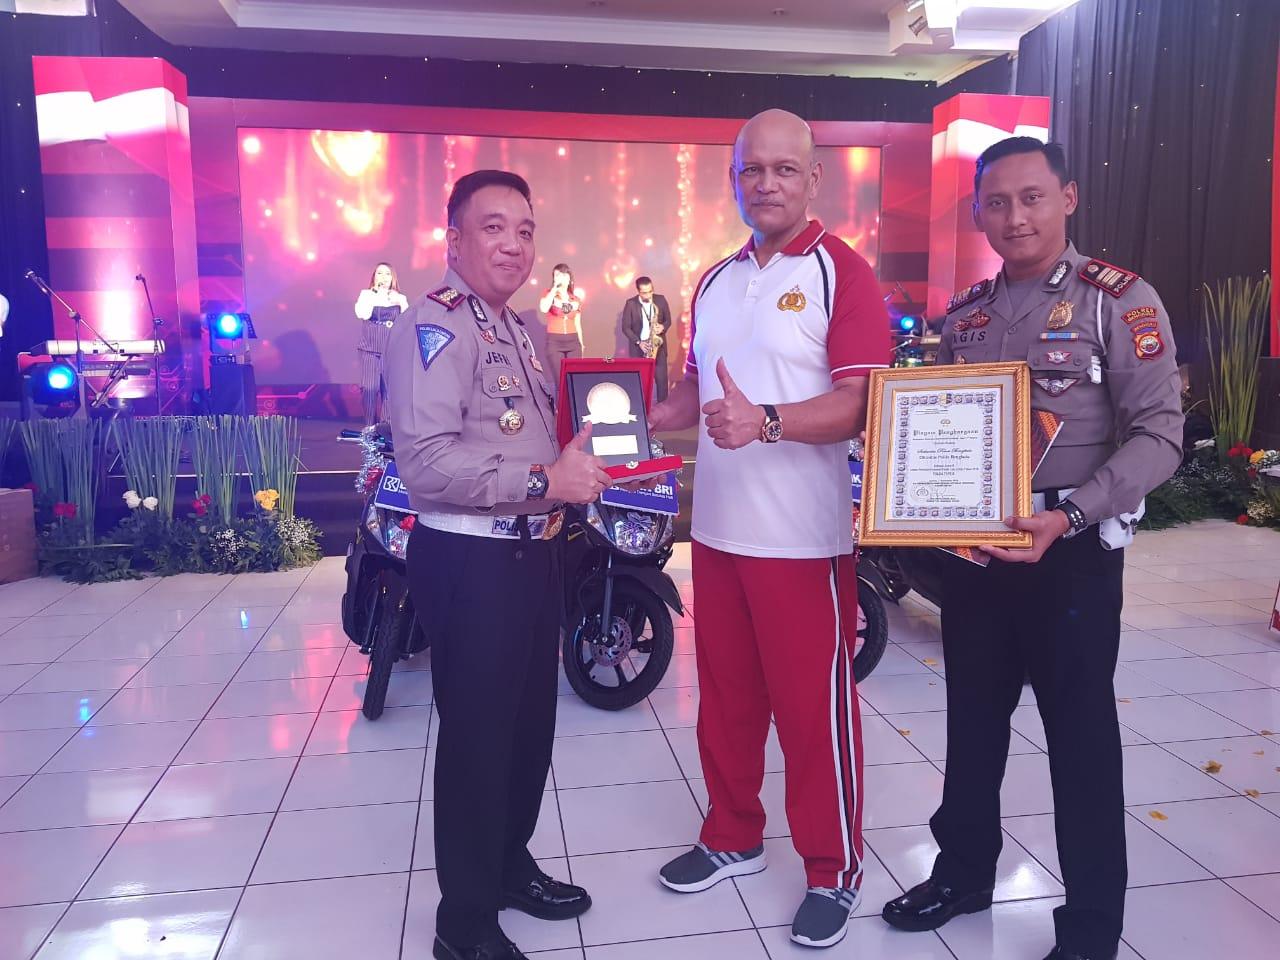 Direktorat Lalu Lintas Polda Bengkulu Sabet Juara 2 Kawasan Tertib Lalu Lintas